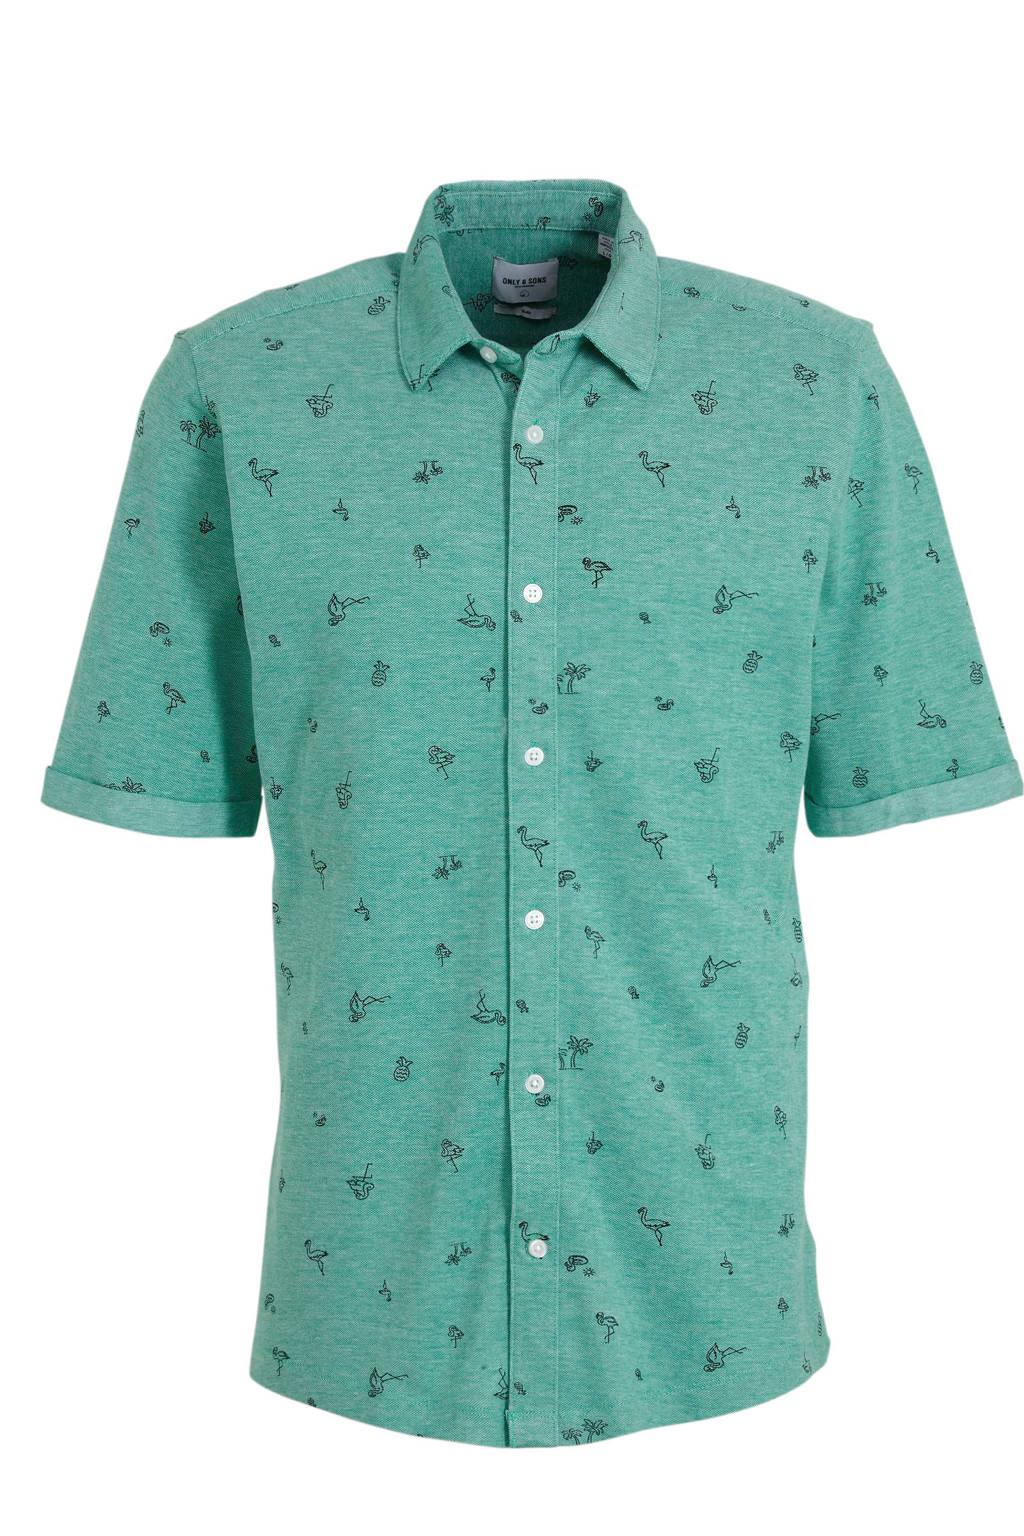 ONLY & SONS regular fit overhemd met all over print groen/zwart, Groen/zwart